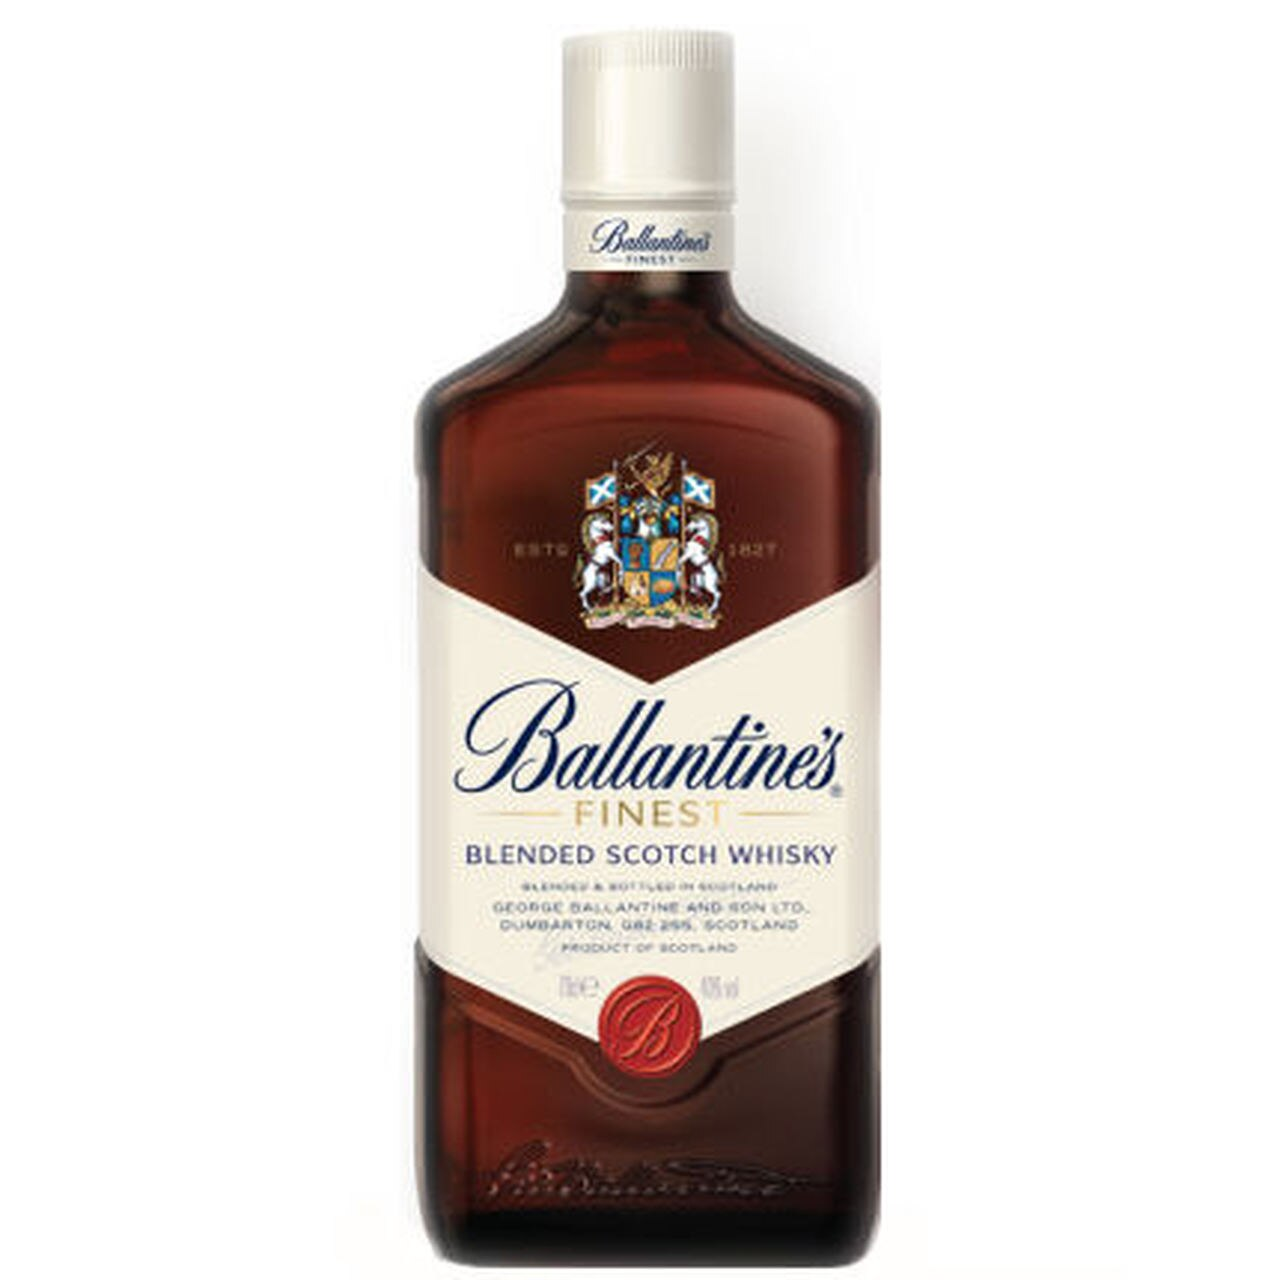 ballantines-finest-blended-scotch-whisky__71817.1496358704